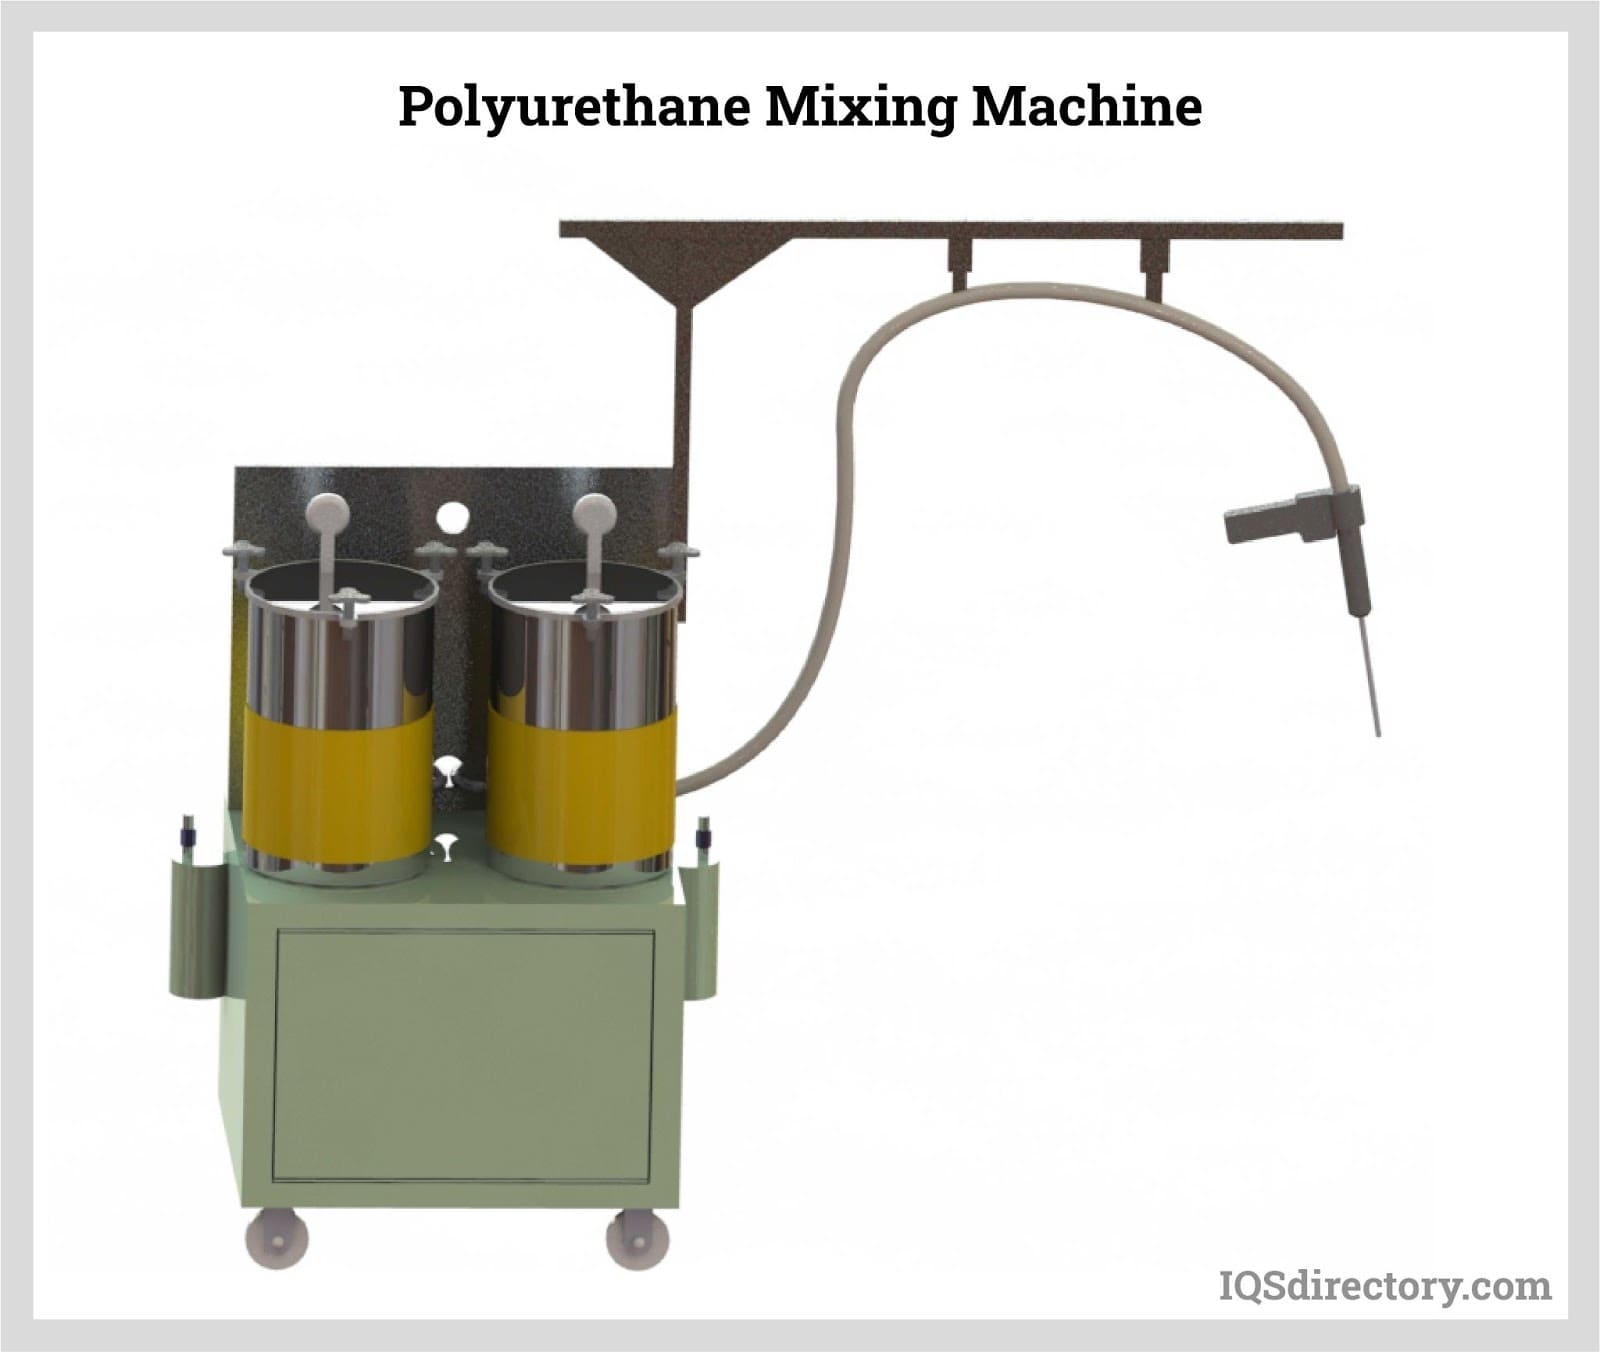 Polyurethane Mixing Machine